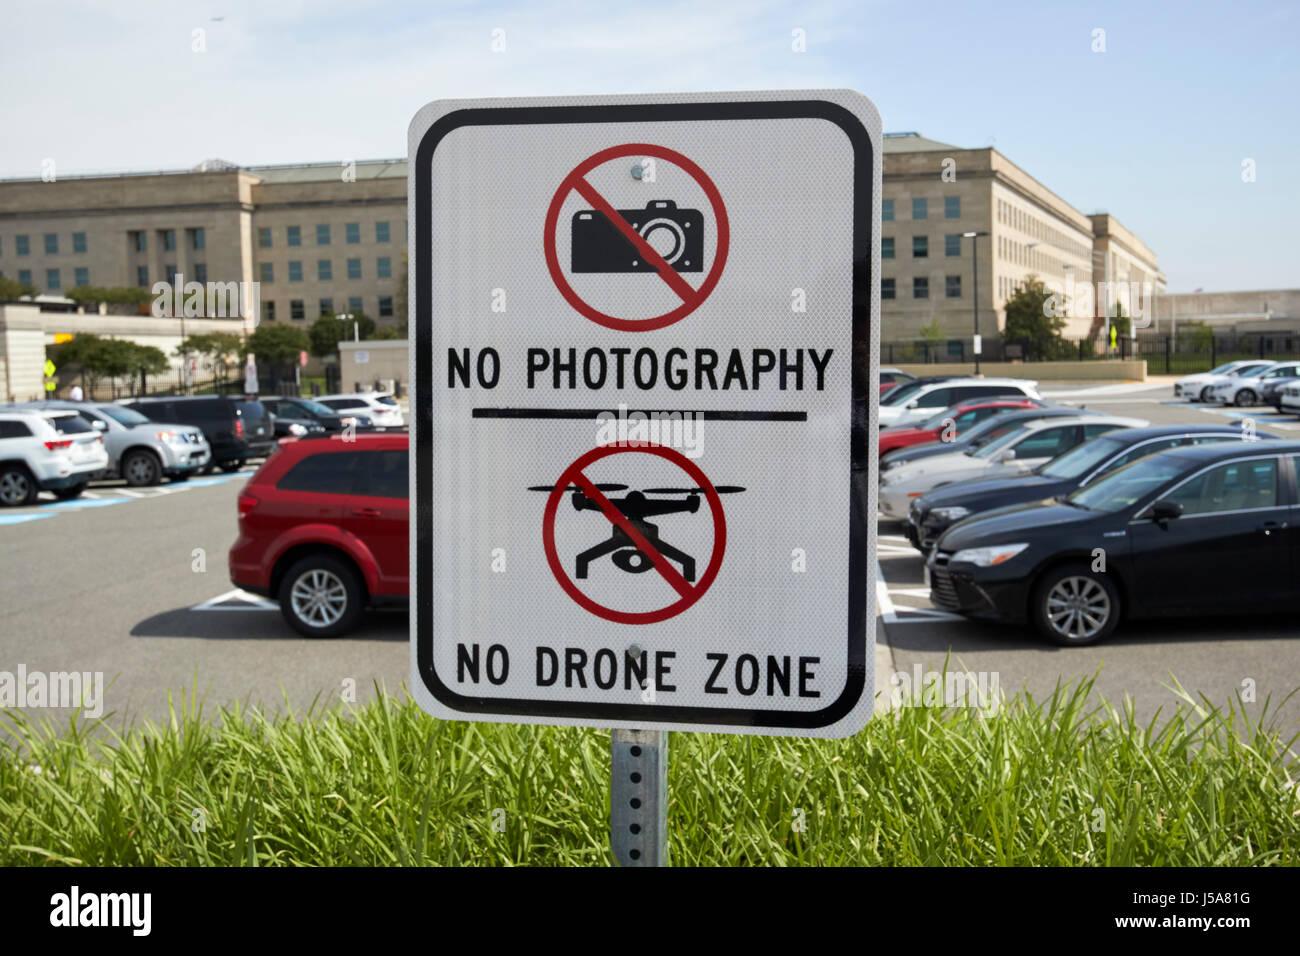 no photography no drone zone outside the pentagon Washington DC USA - Stock Image